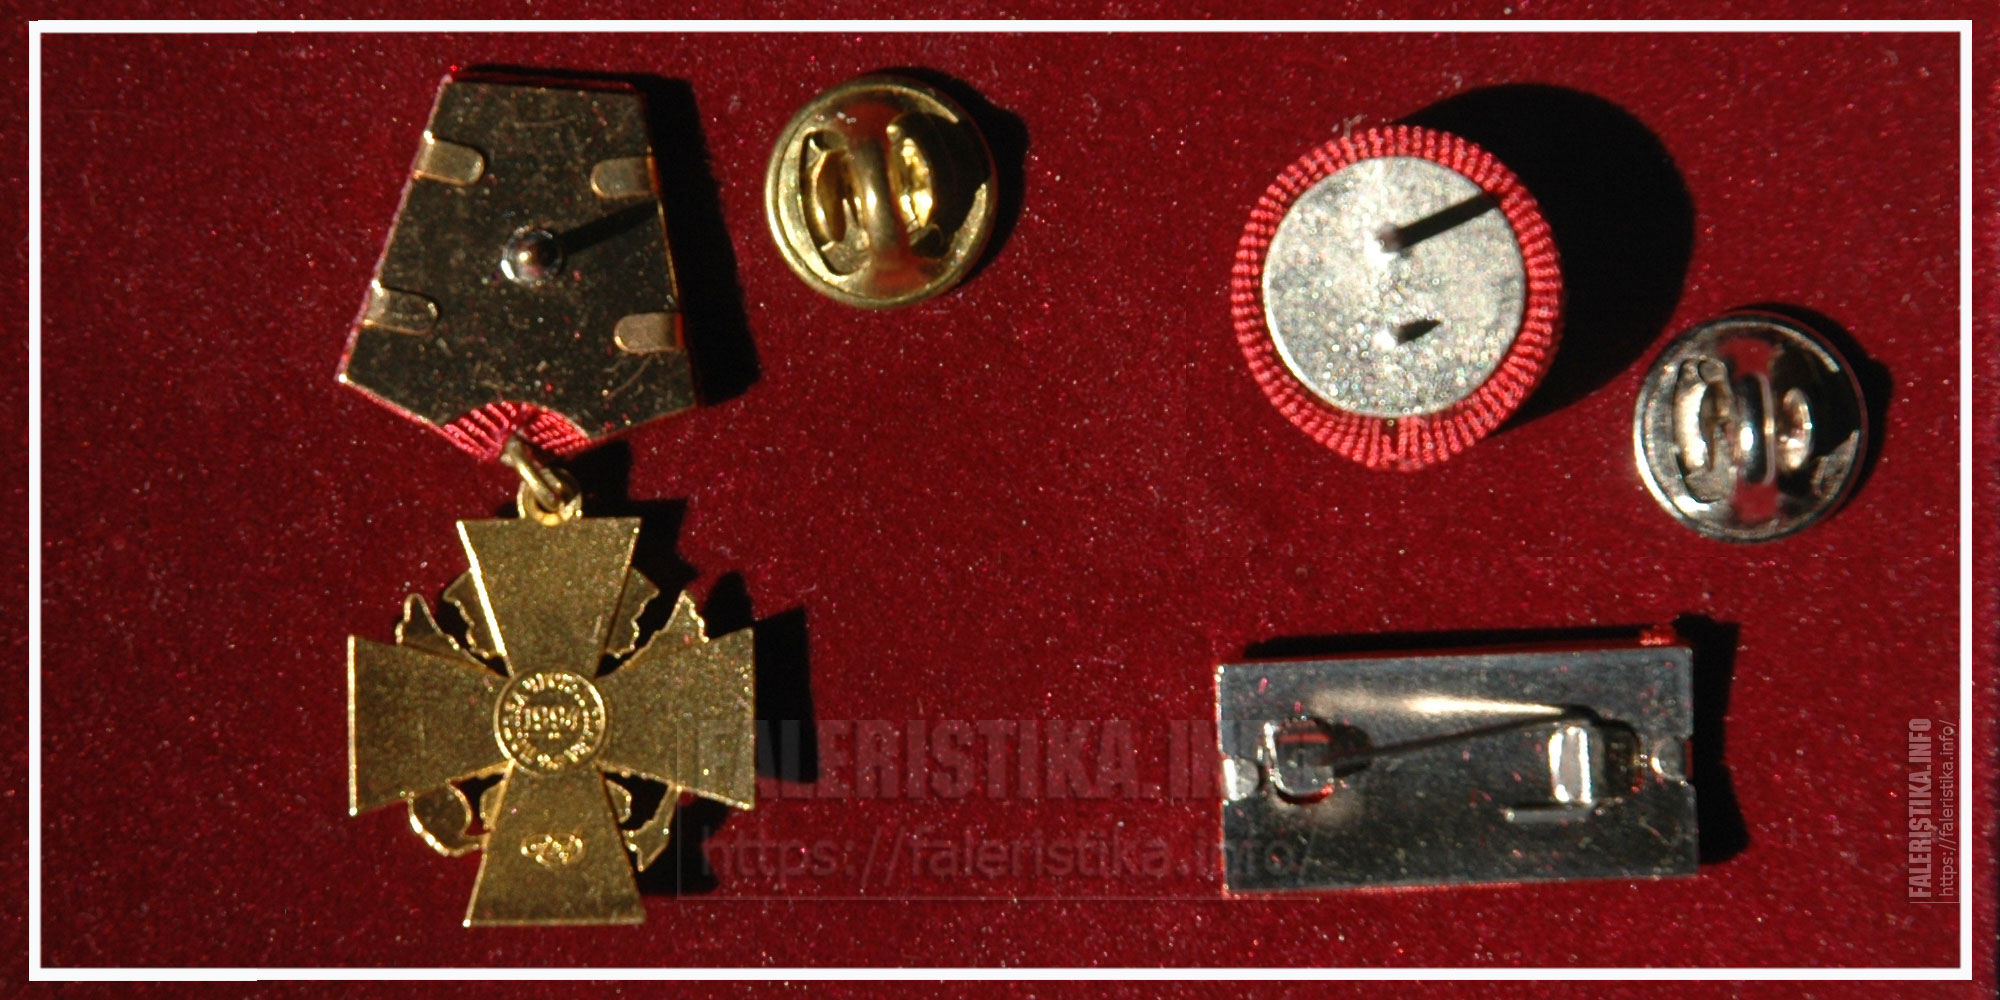 "Орден ""За заслуги перед Отечеством"" IV степени. Фрачная миниатюра, розетка, орденская планка. Реверс"